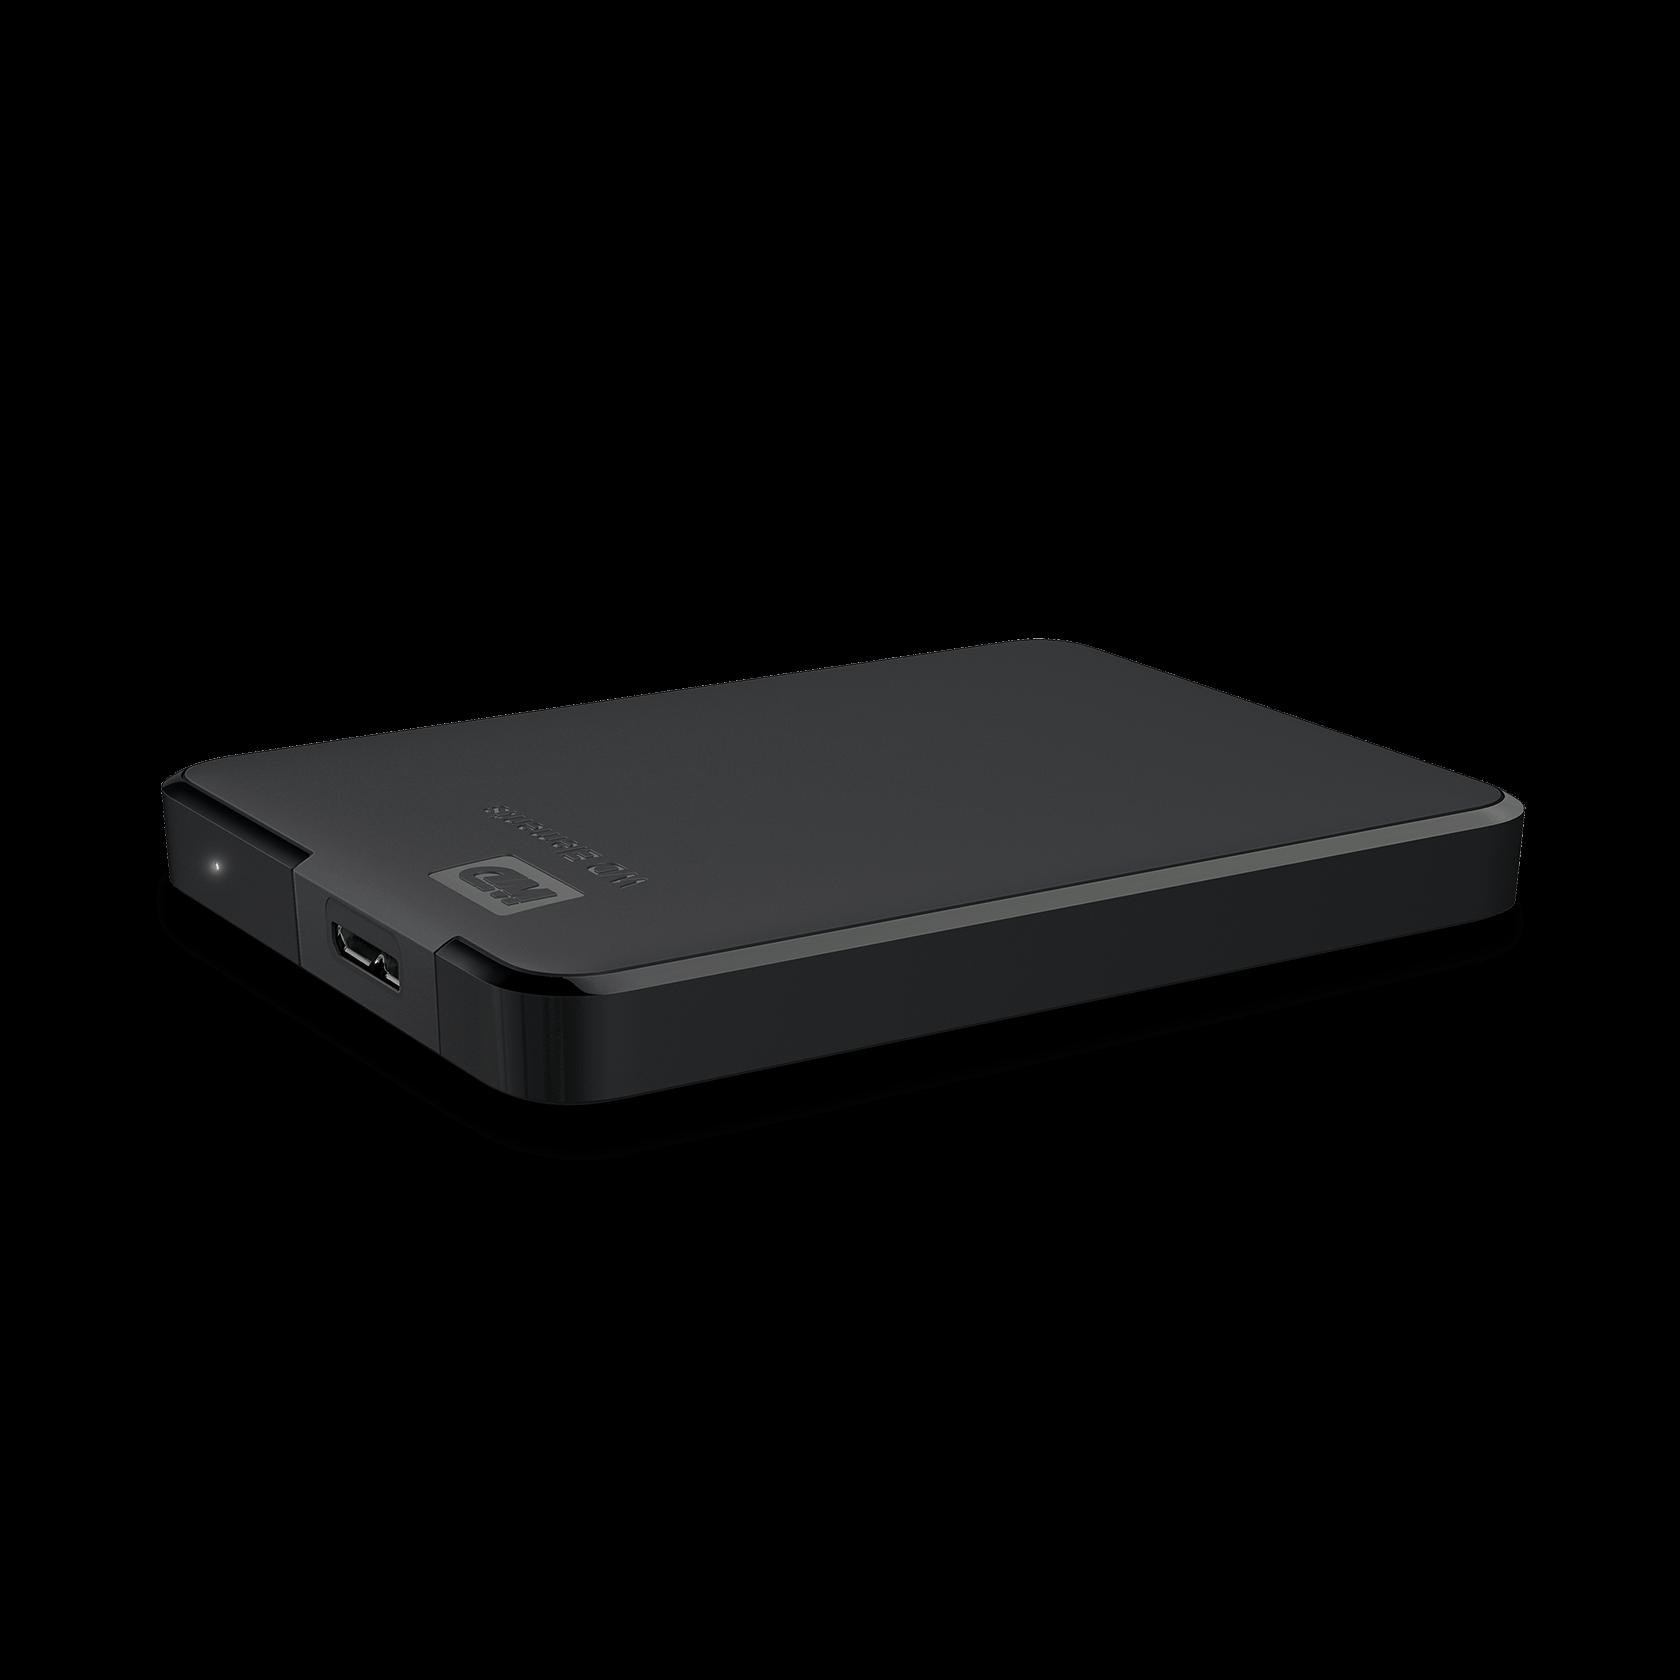 WD WDBU6Y0040BBK-WESN 4TB Elements USB 3.0 High-Capacity Portable Hard Drive for